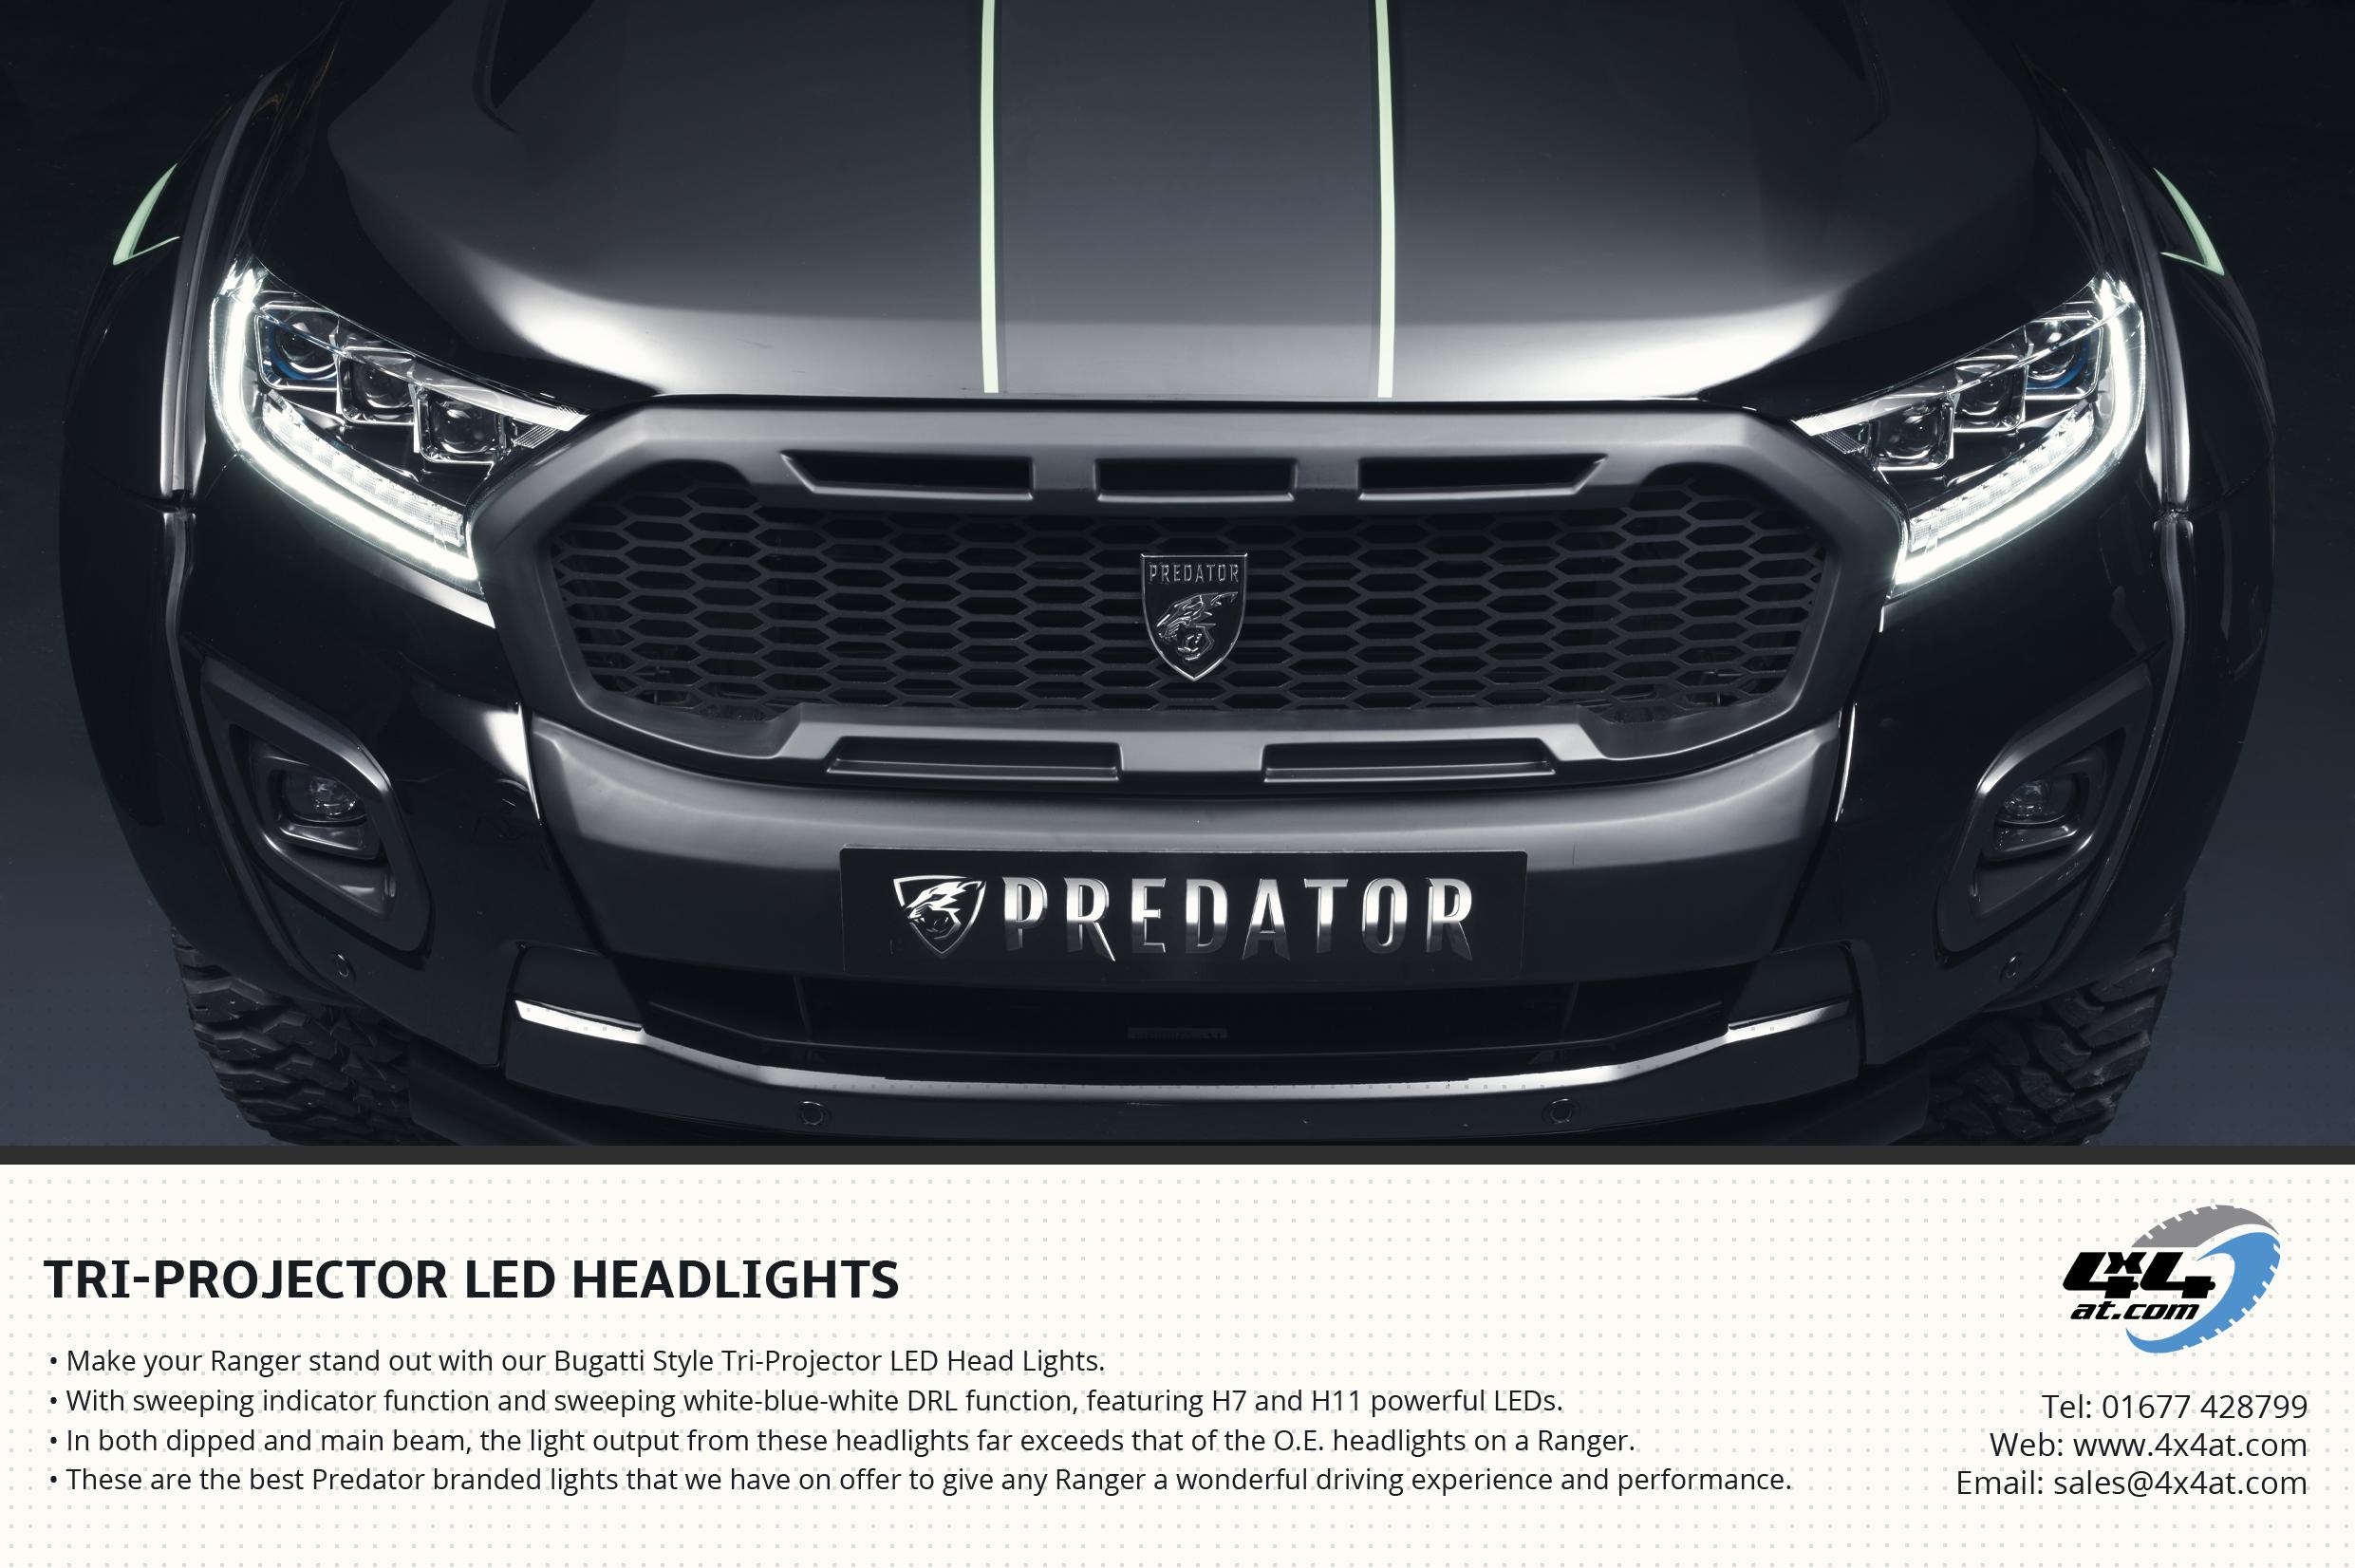 Bugatti Style Headlights Flyer for Ford Ranger